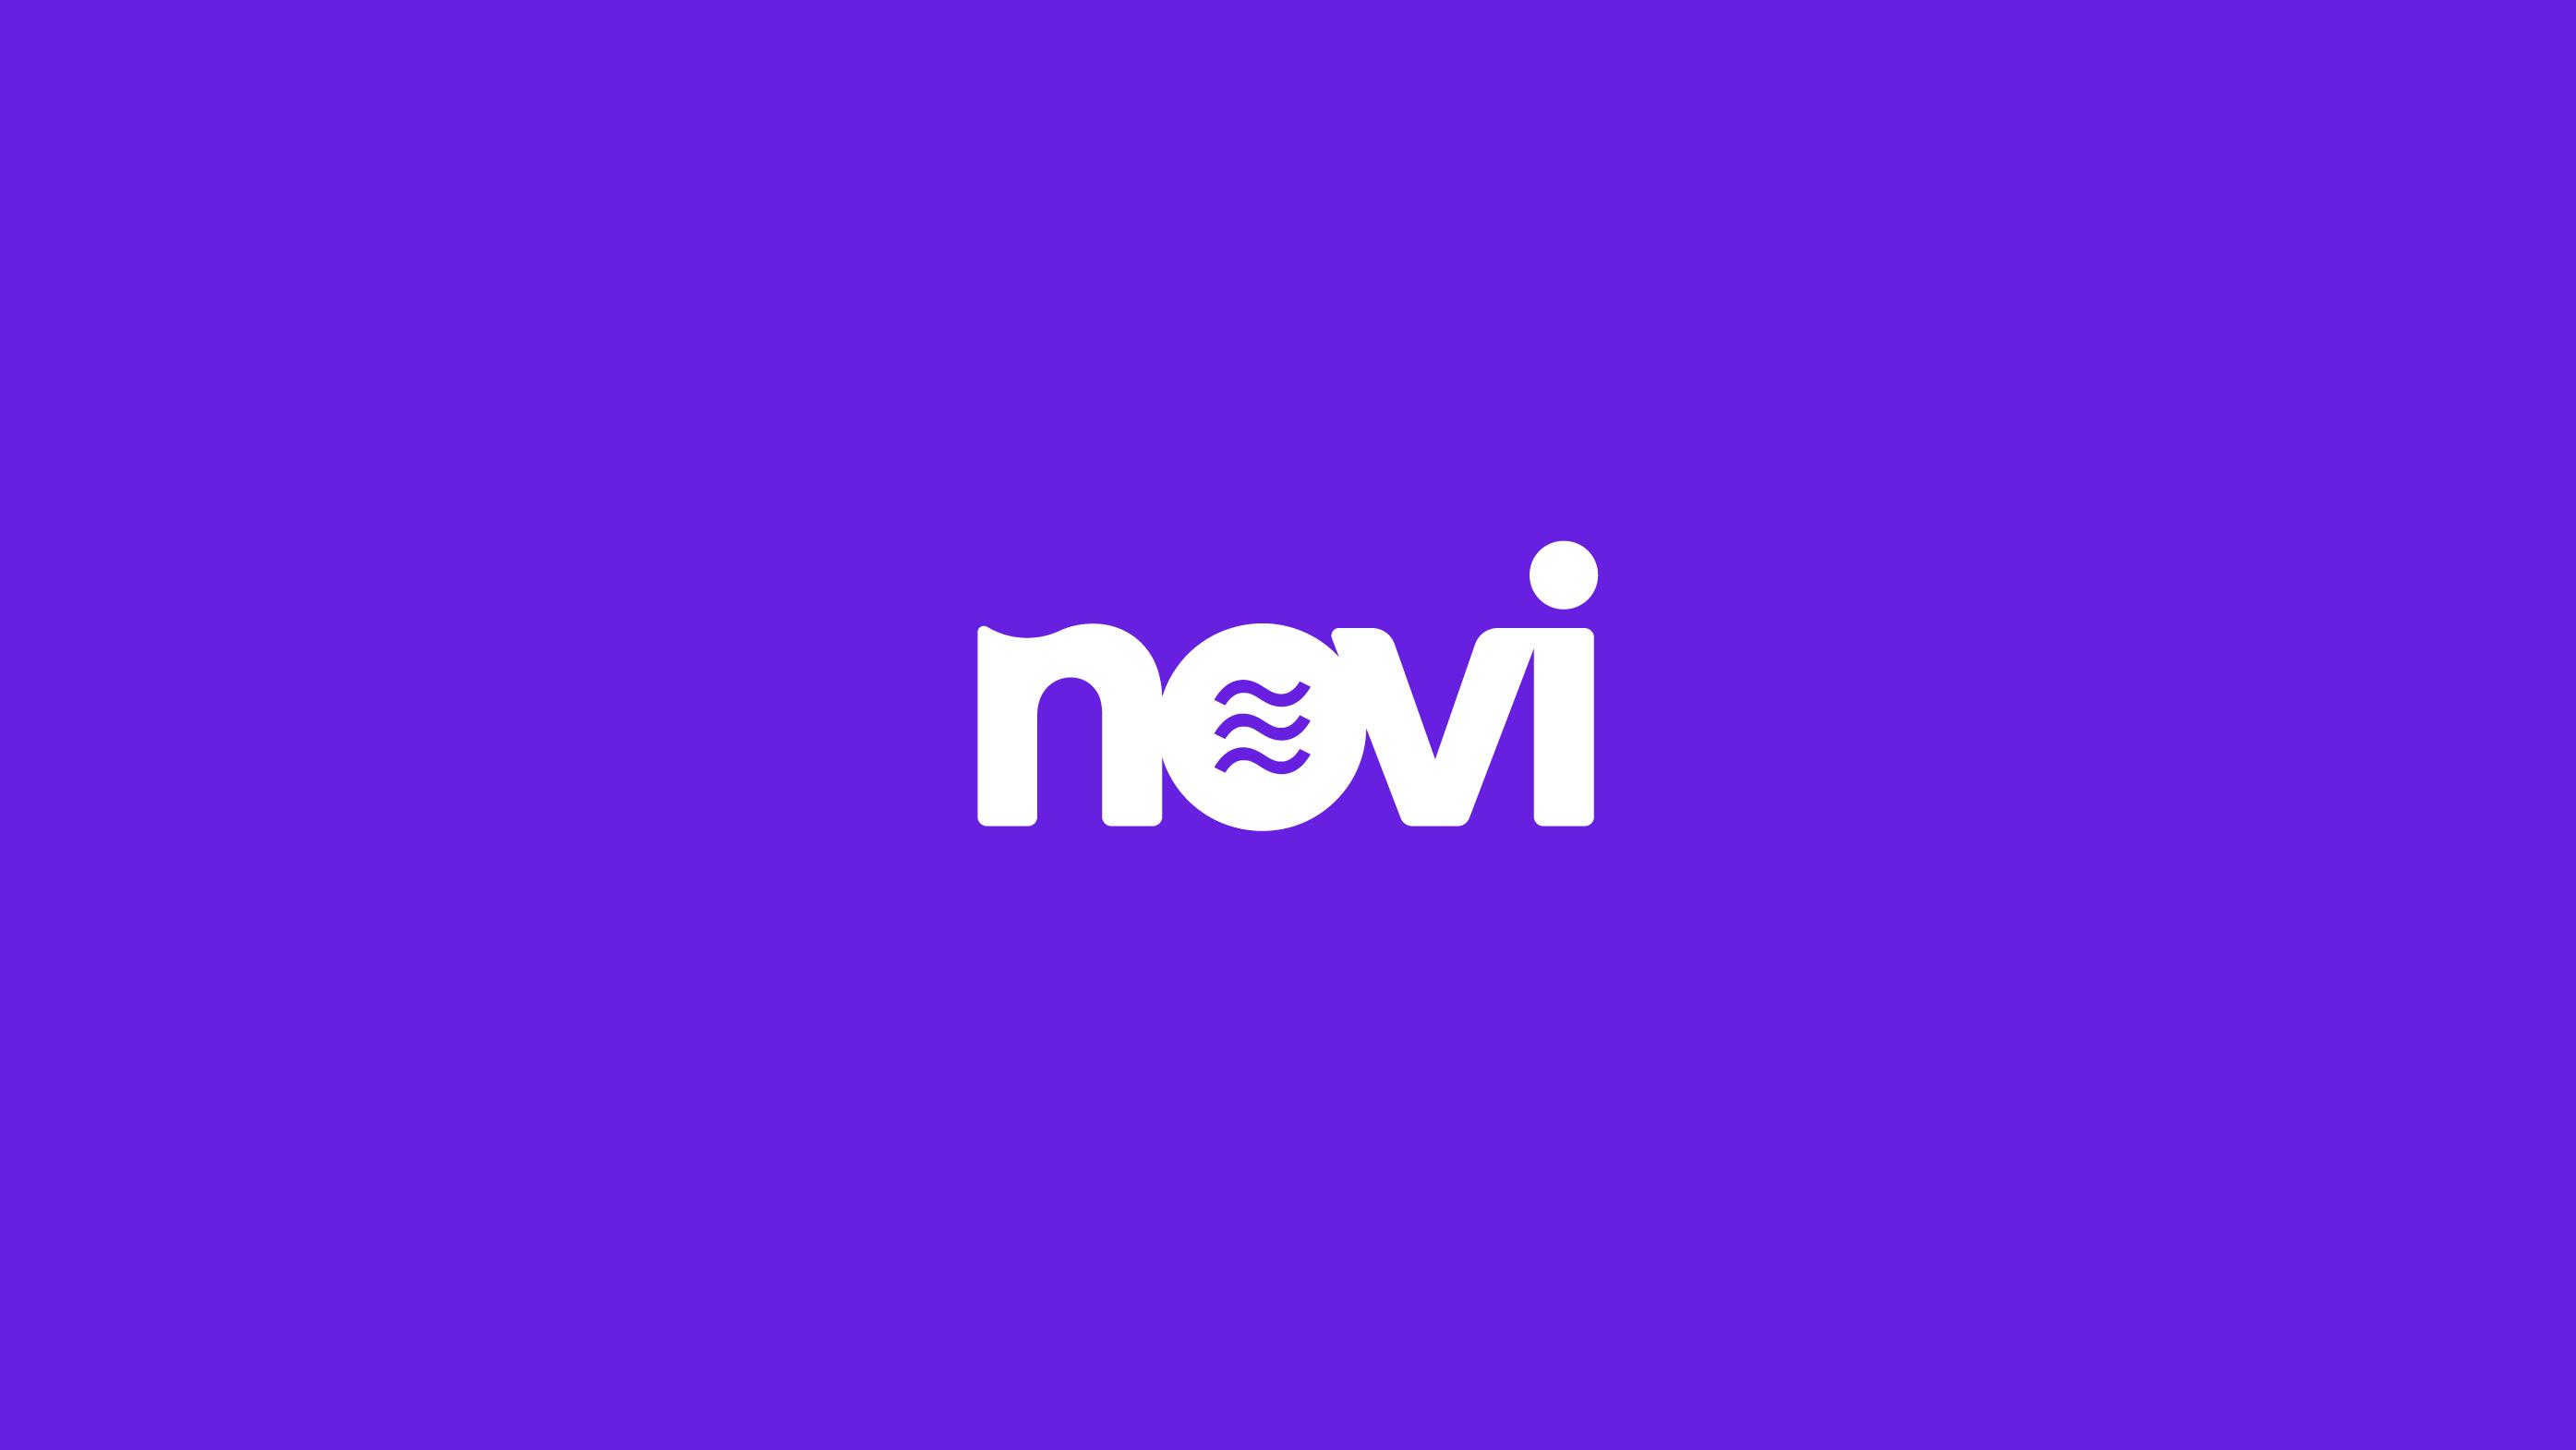 Novi logo and branding